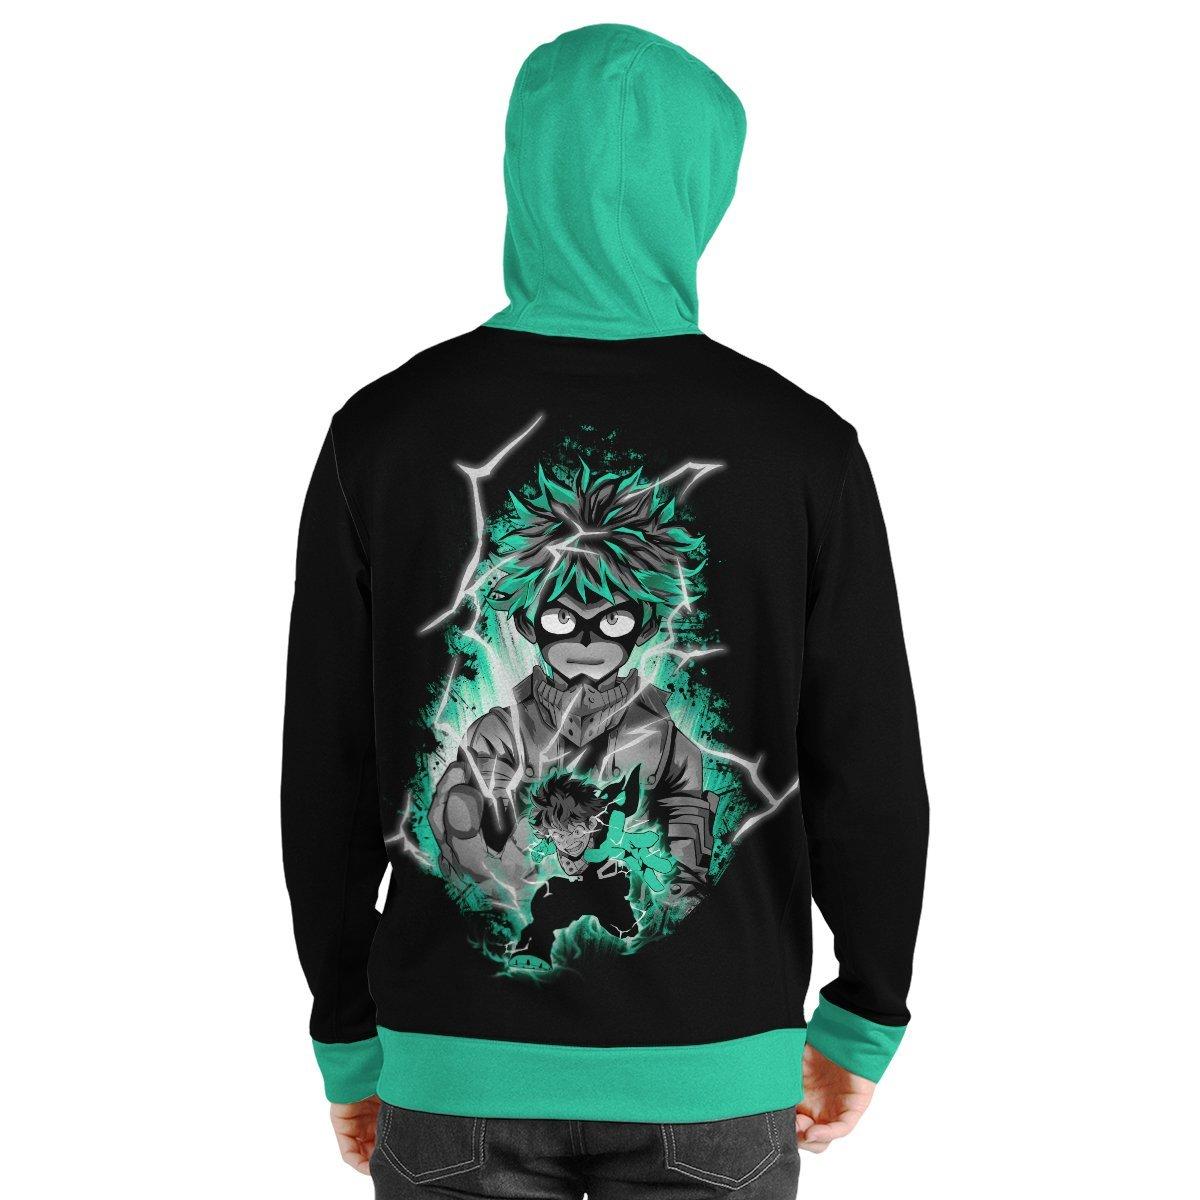 Deku My Hero Academia 3d hoodie - LIMITED EDITION